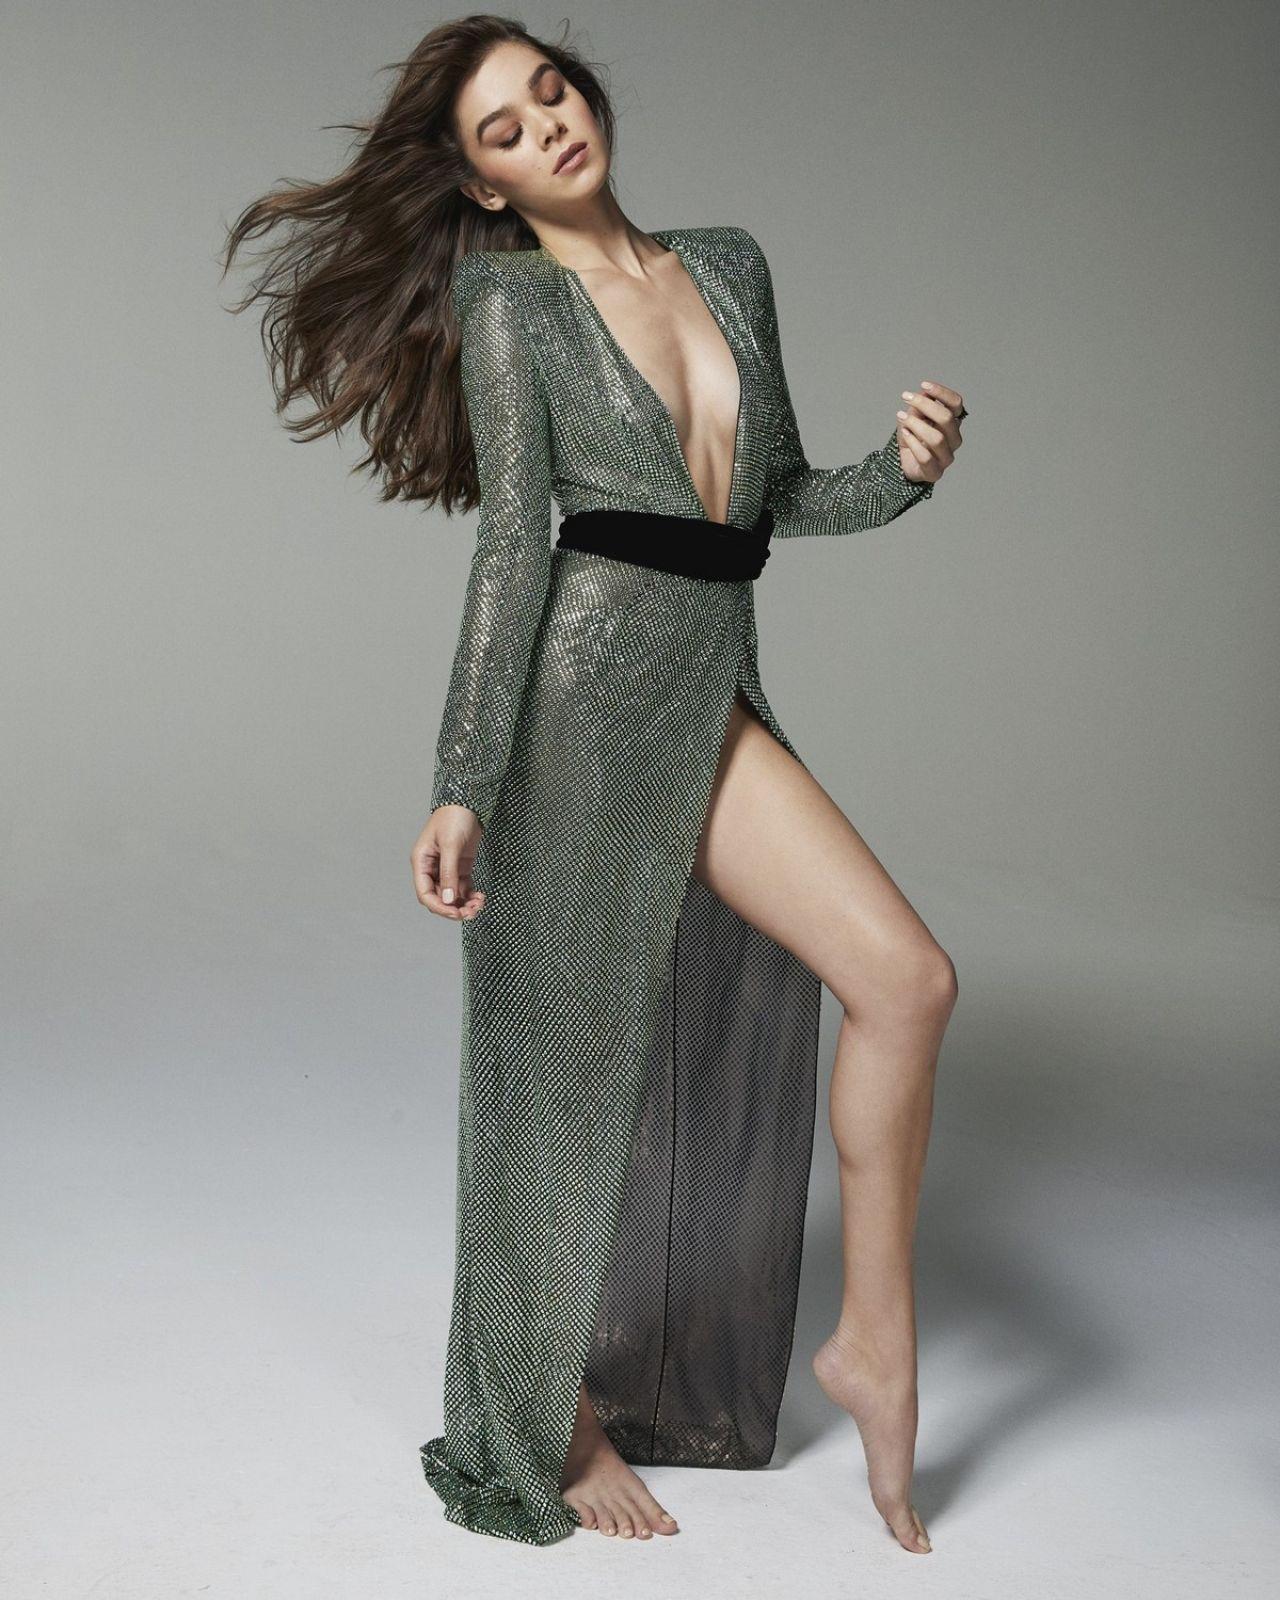 Hailee Steinfeld en robe fendue très décolletée